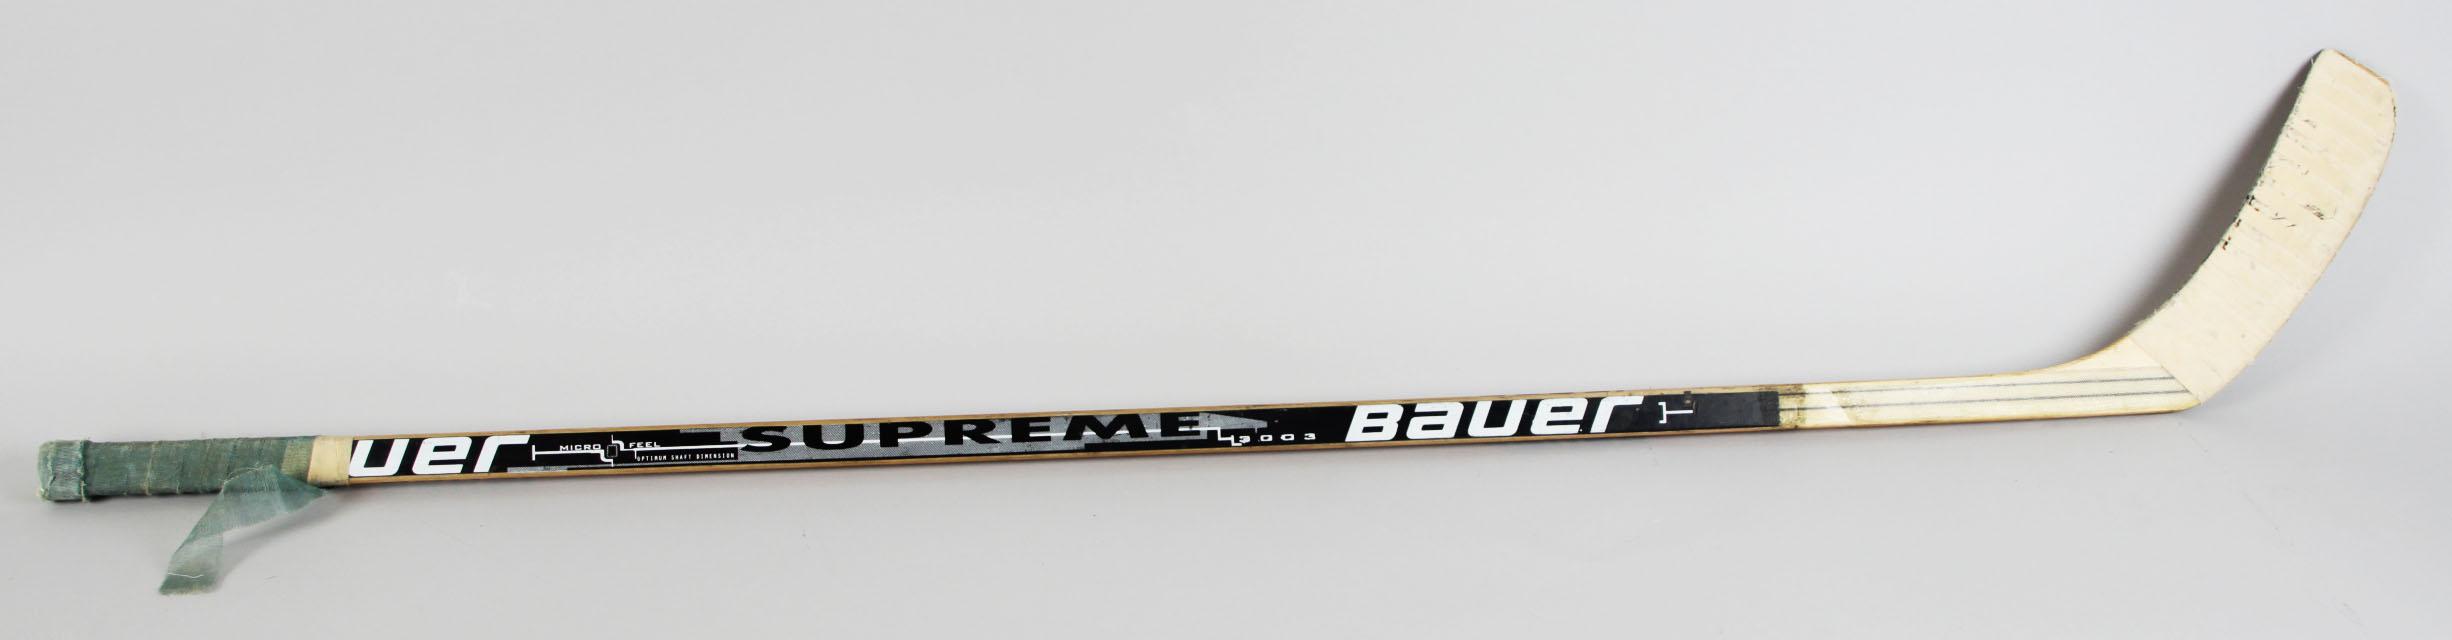 Montreal Canadiens - Valeri Bure Game-Used Hockey Stick - COA